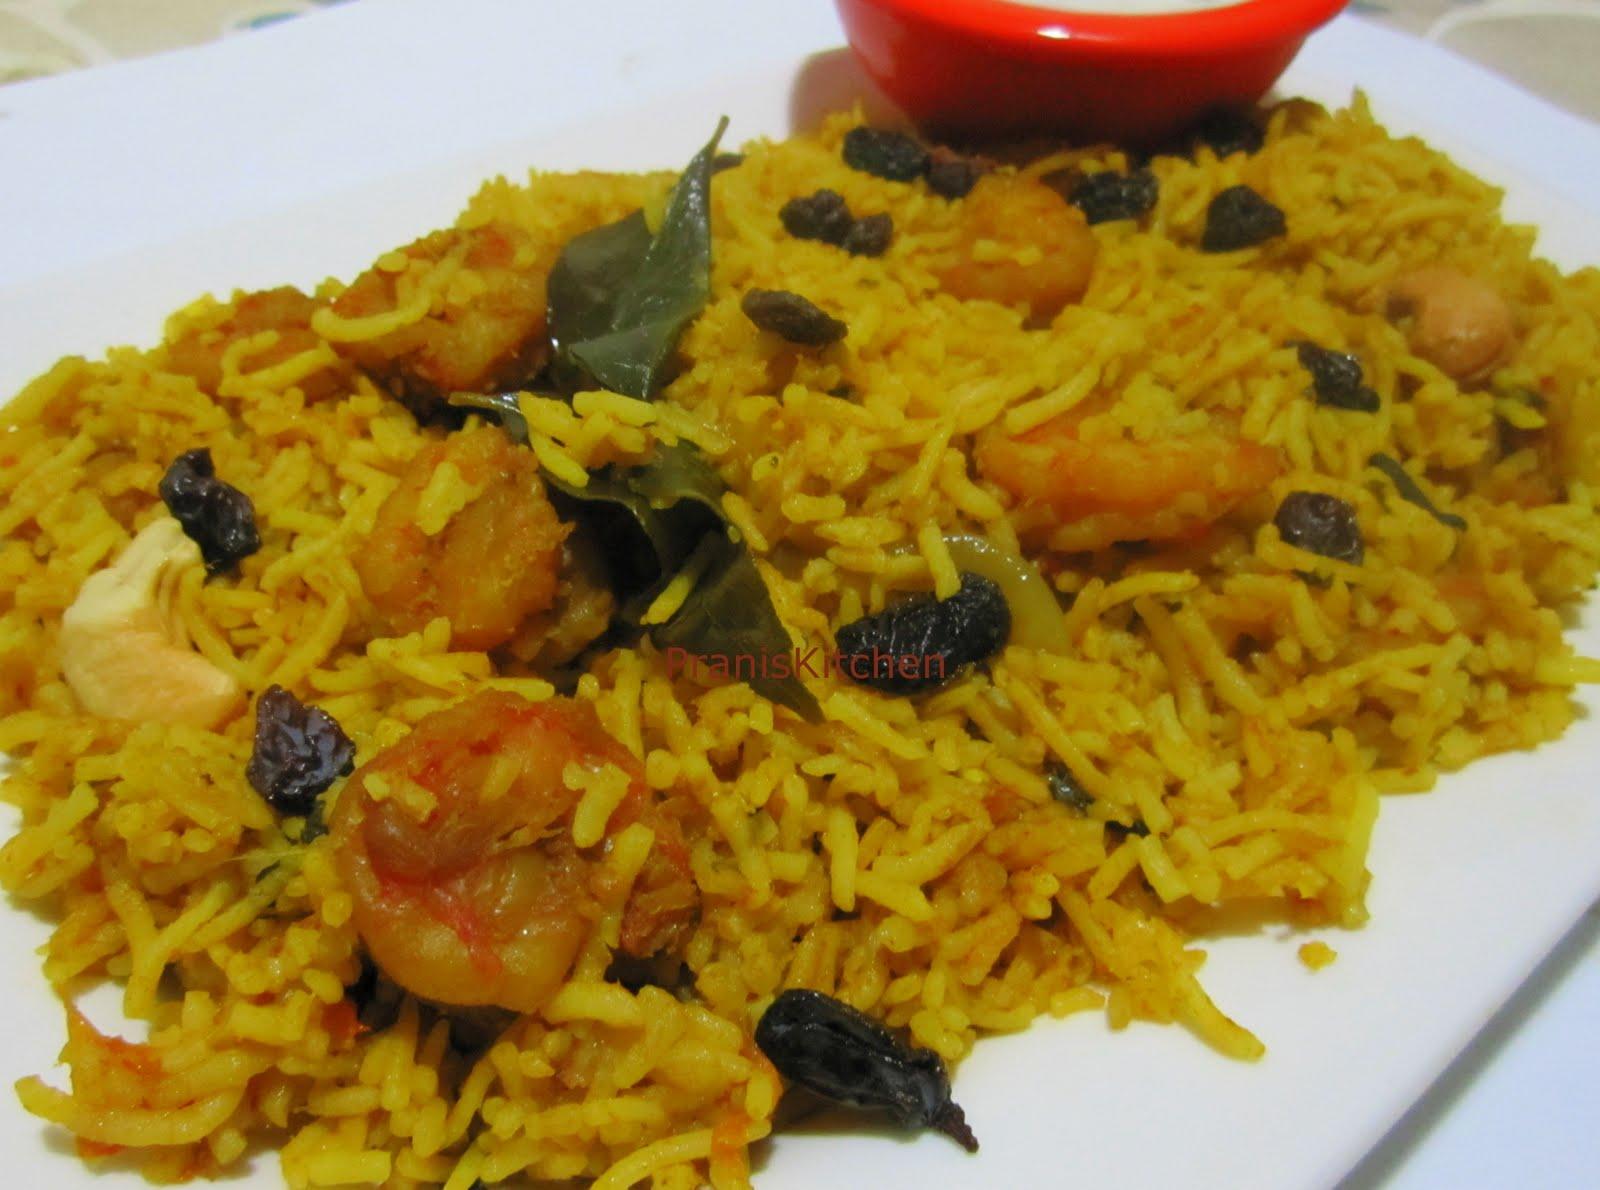 ... for food lovers -Try it you 'll love it: Shrimp Biryani/Prawn Biryani